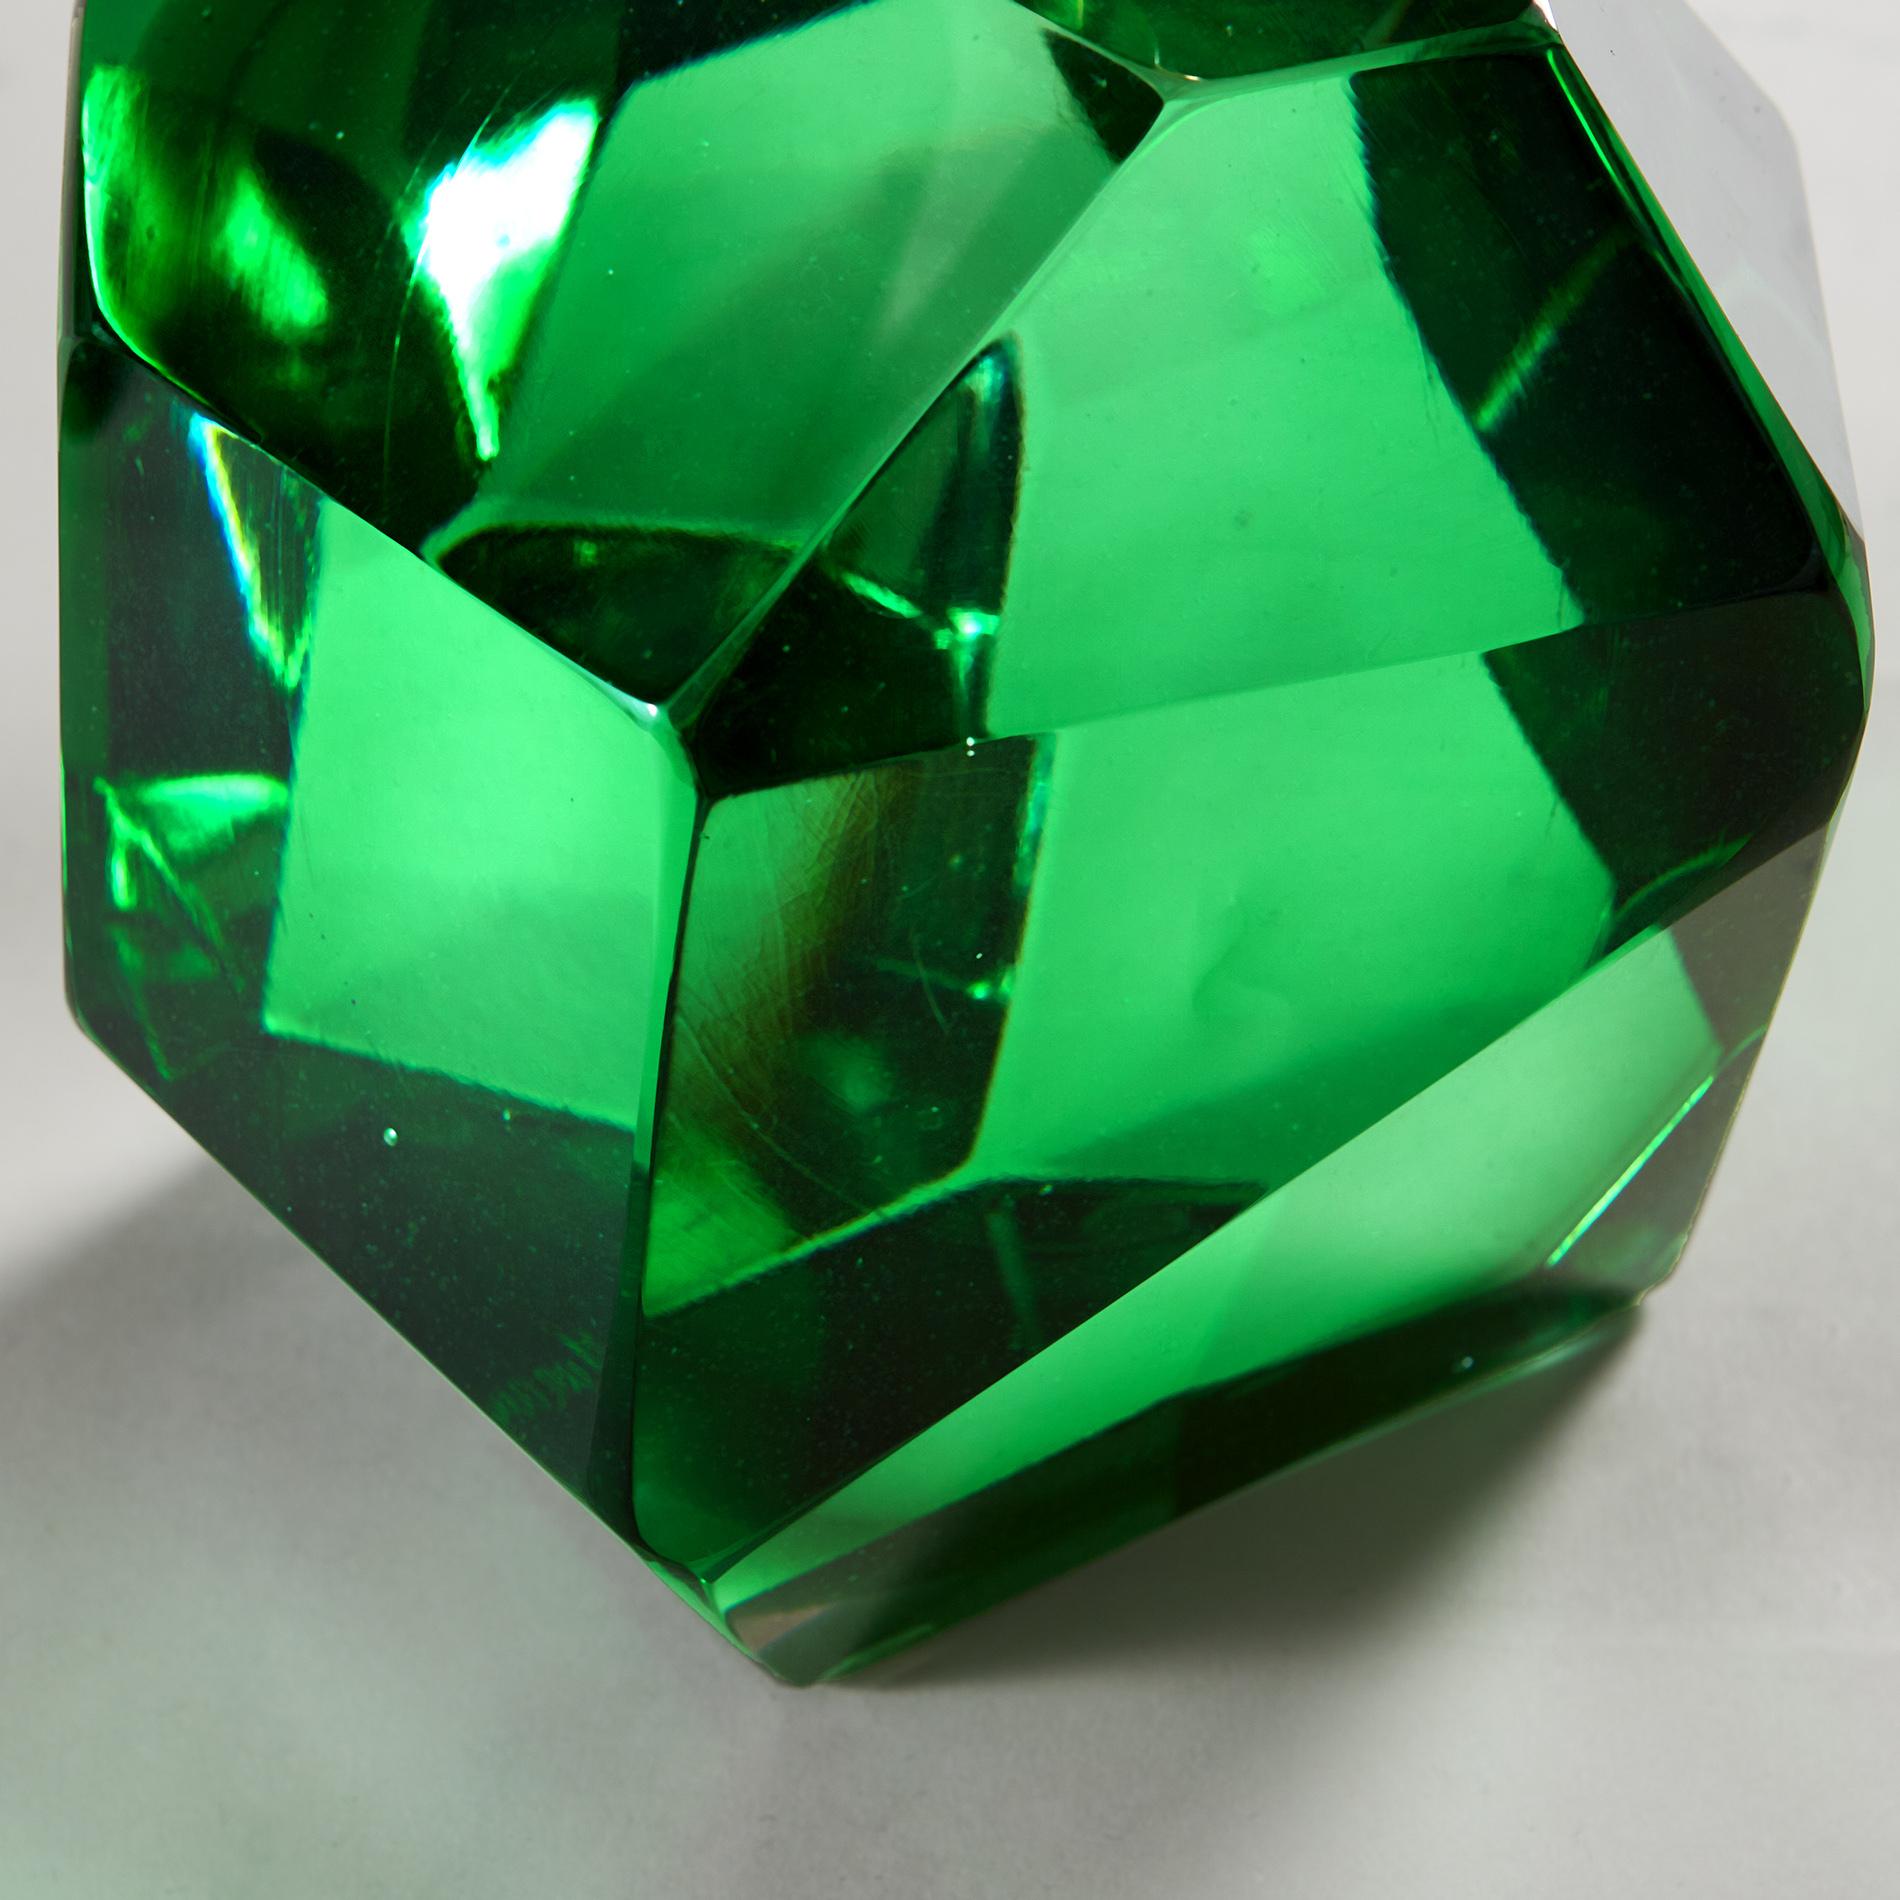 Emerald Green Rock Lamp 20210225 Valerie Wade 2 224 V1